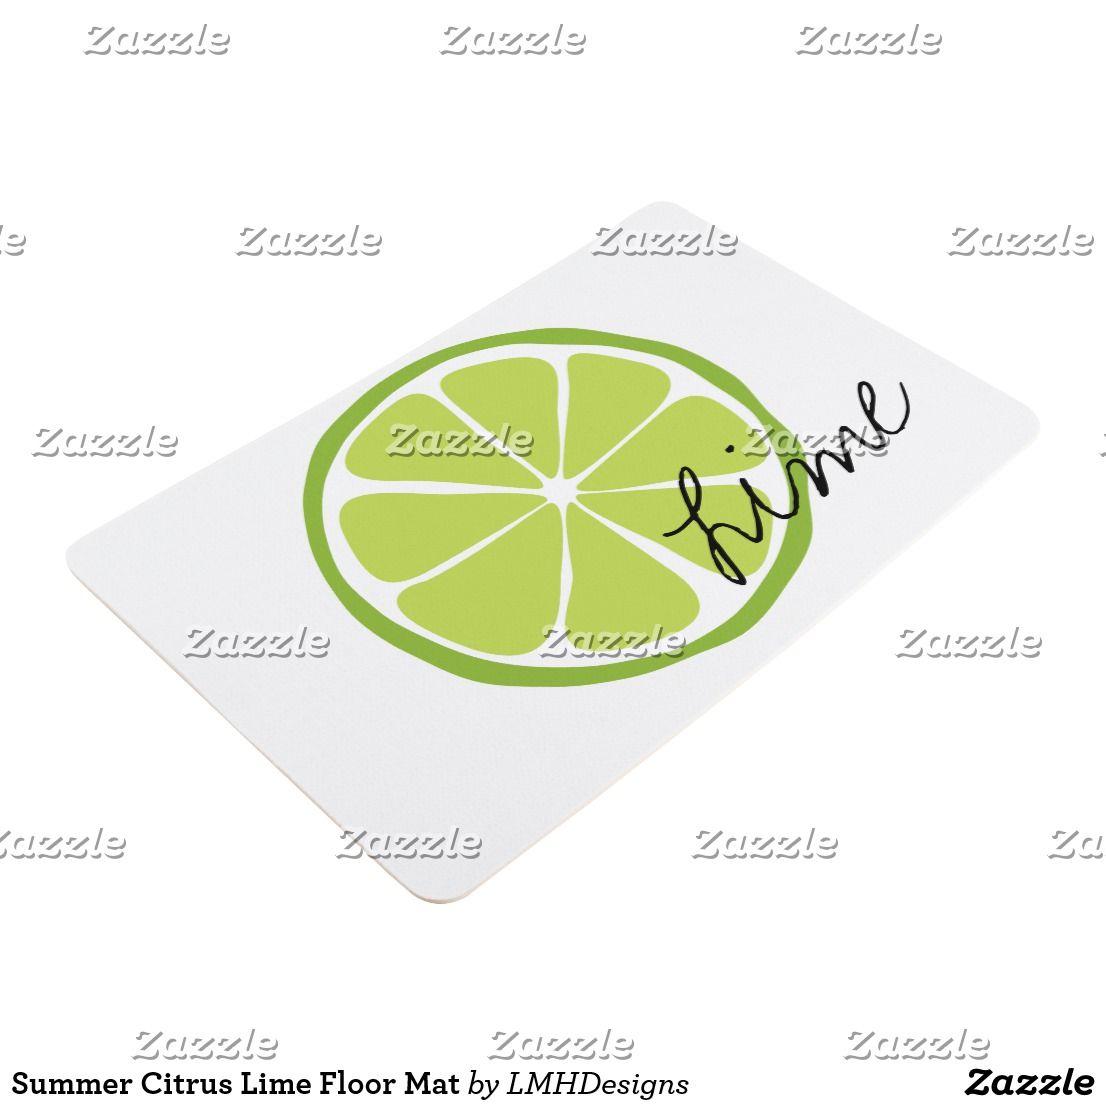 Summer Citrus Lime Floor Mat Zazzle Com Lime Green Kitchen Flooring Floor Mats